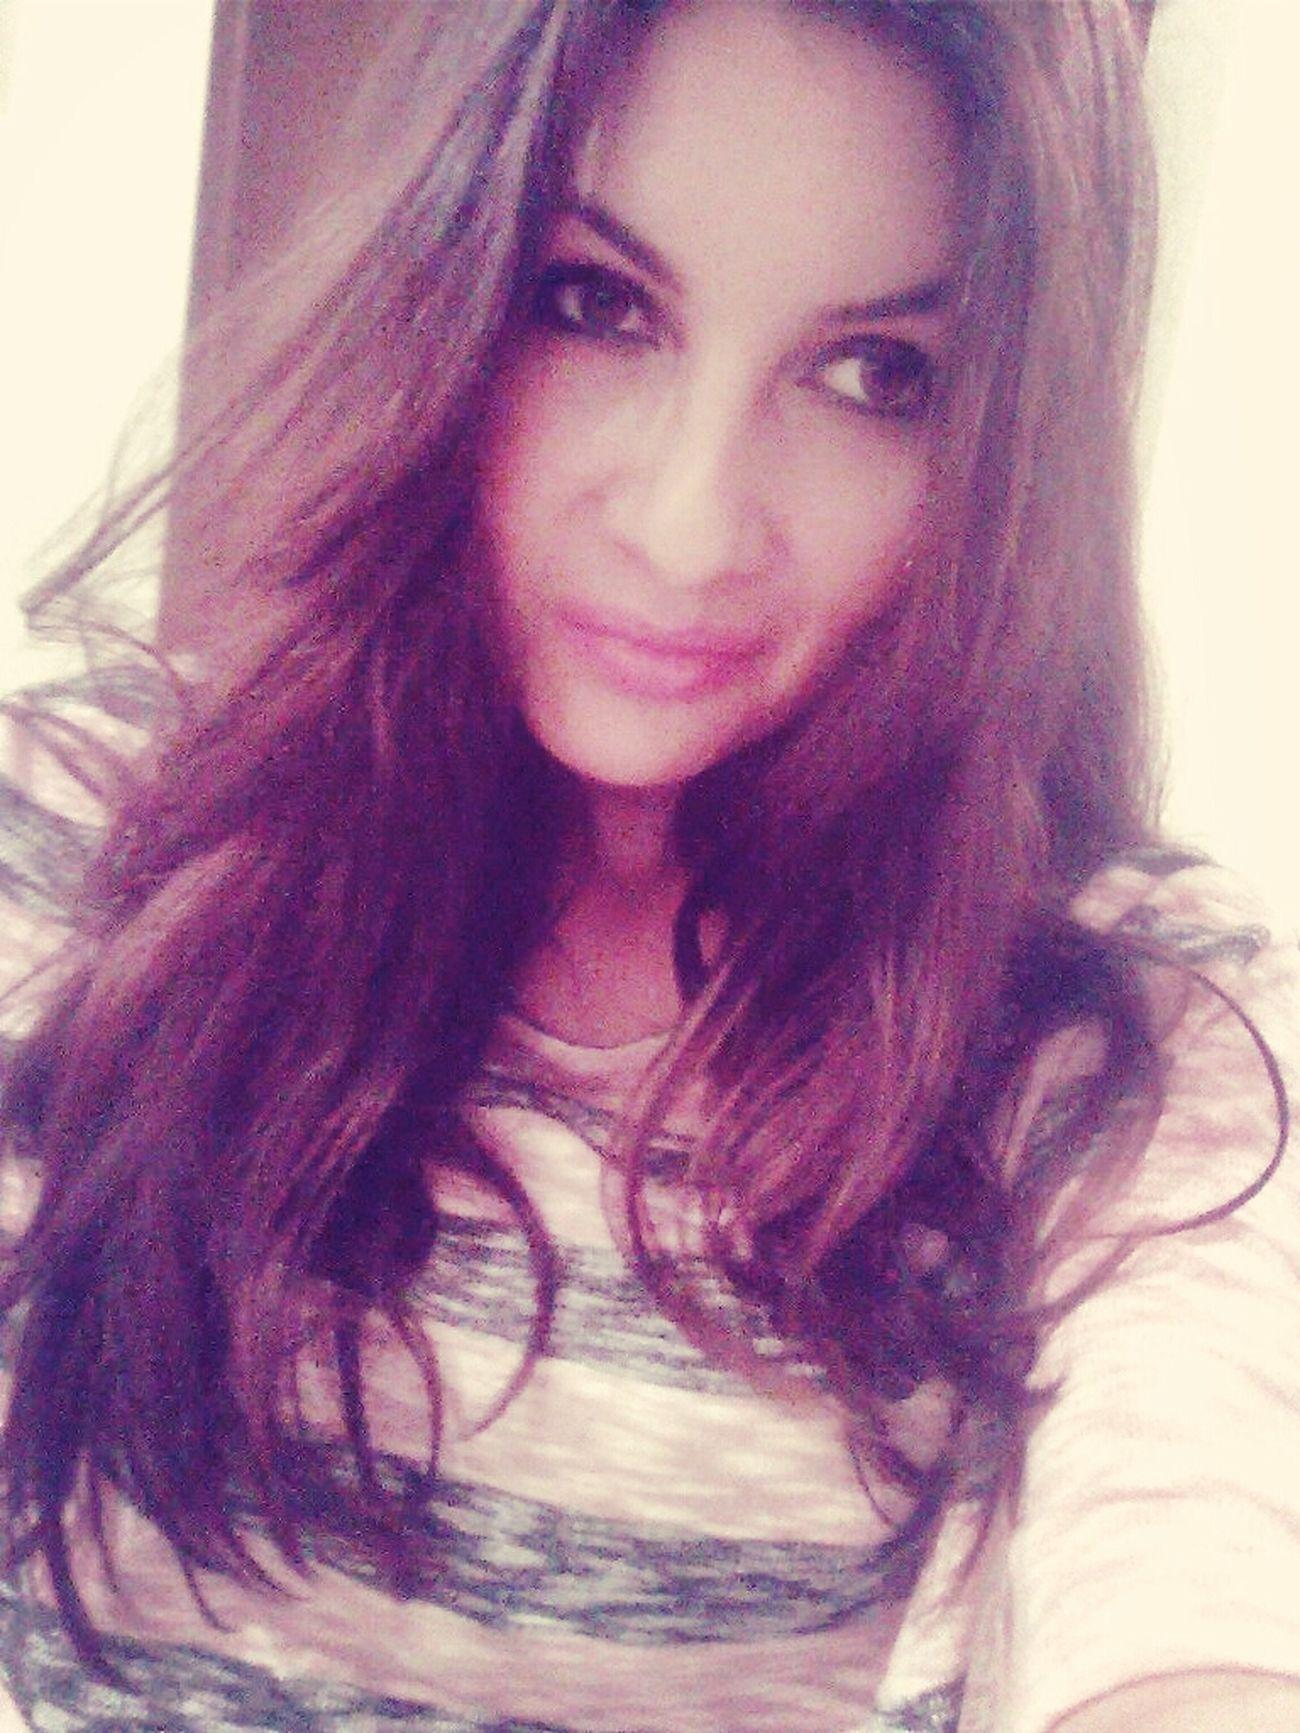 Selfie Pink #lips #love #smile #pink #cute #pretty You Make Me Smile